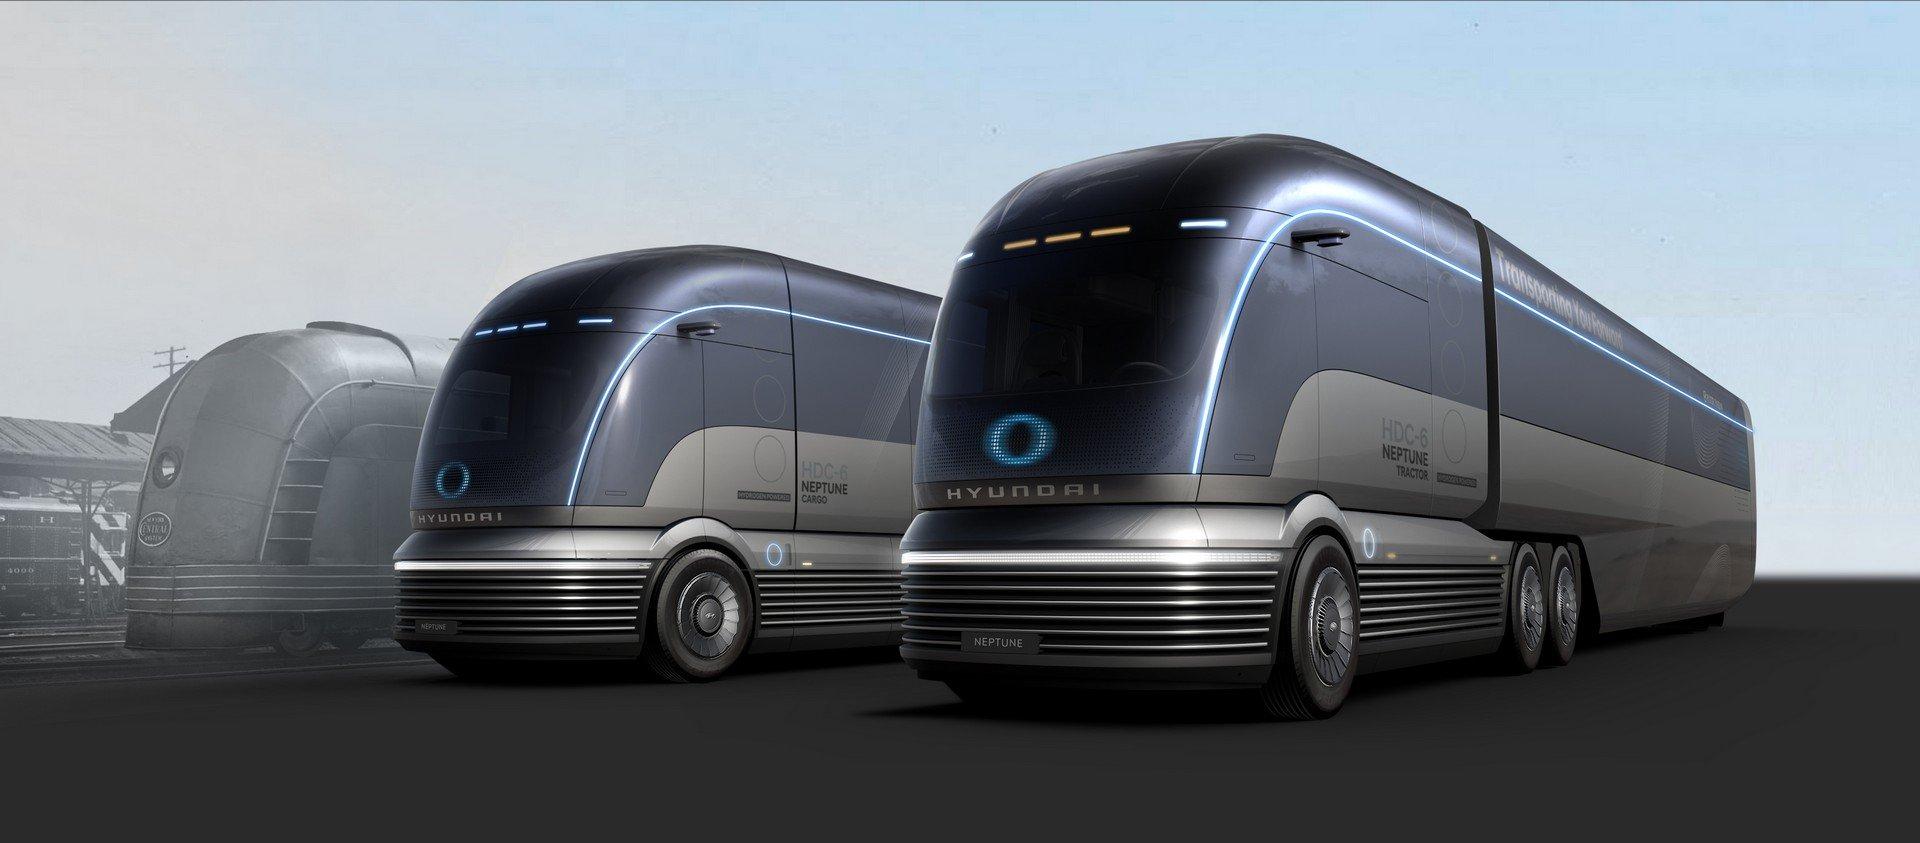 Hyundai-HDC-6-Neptune-Concept-4